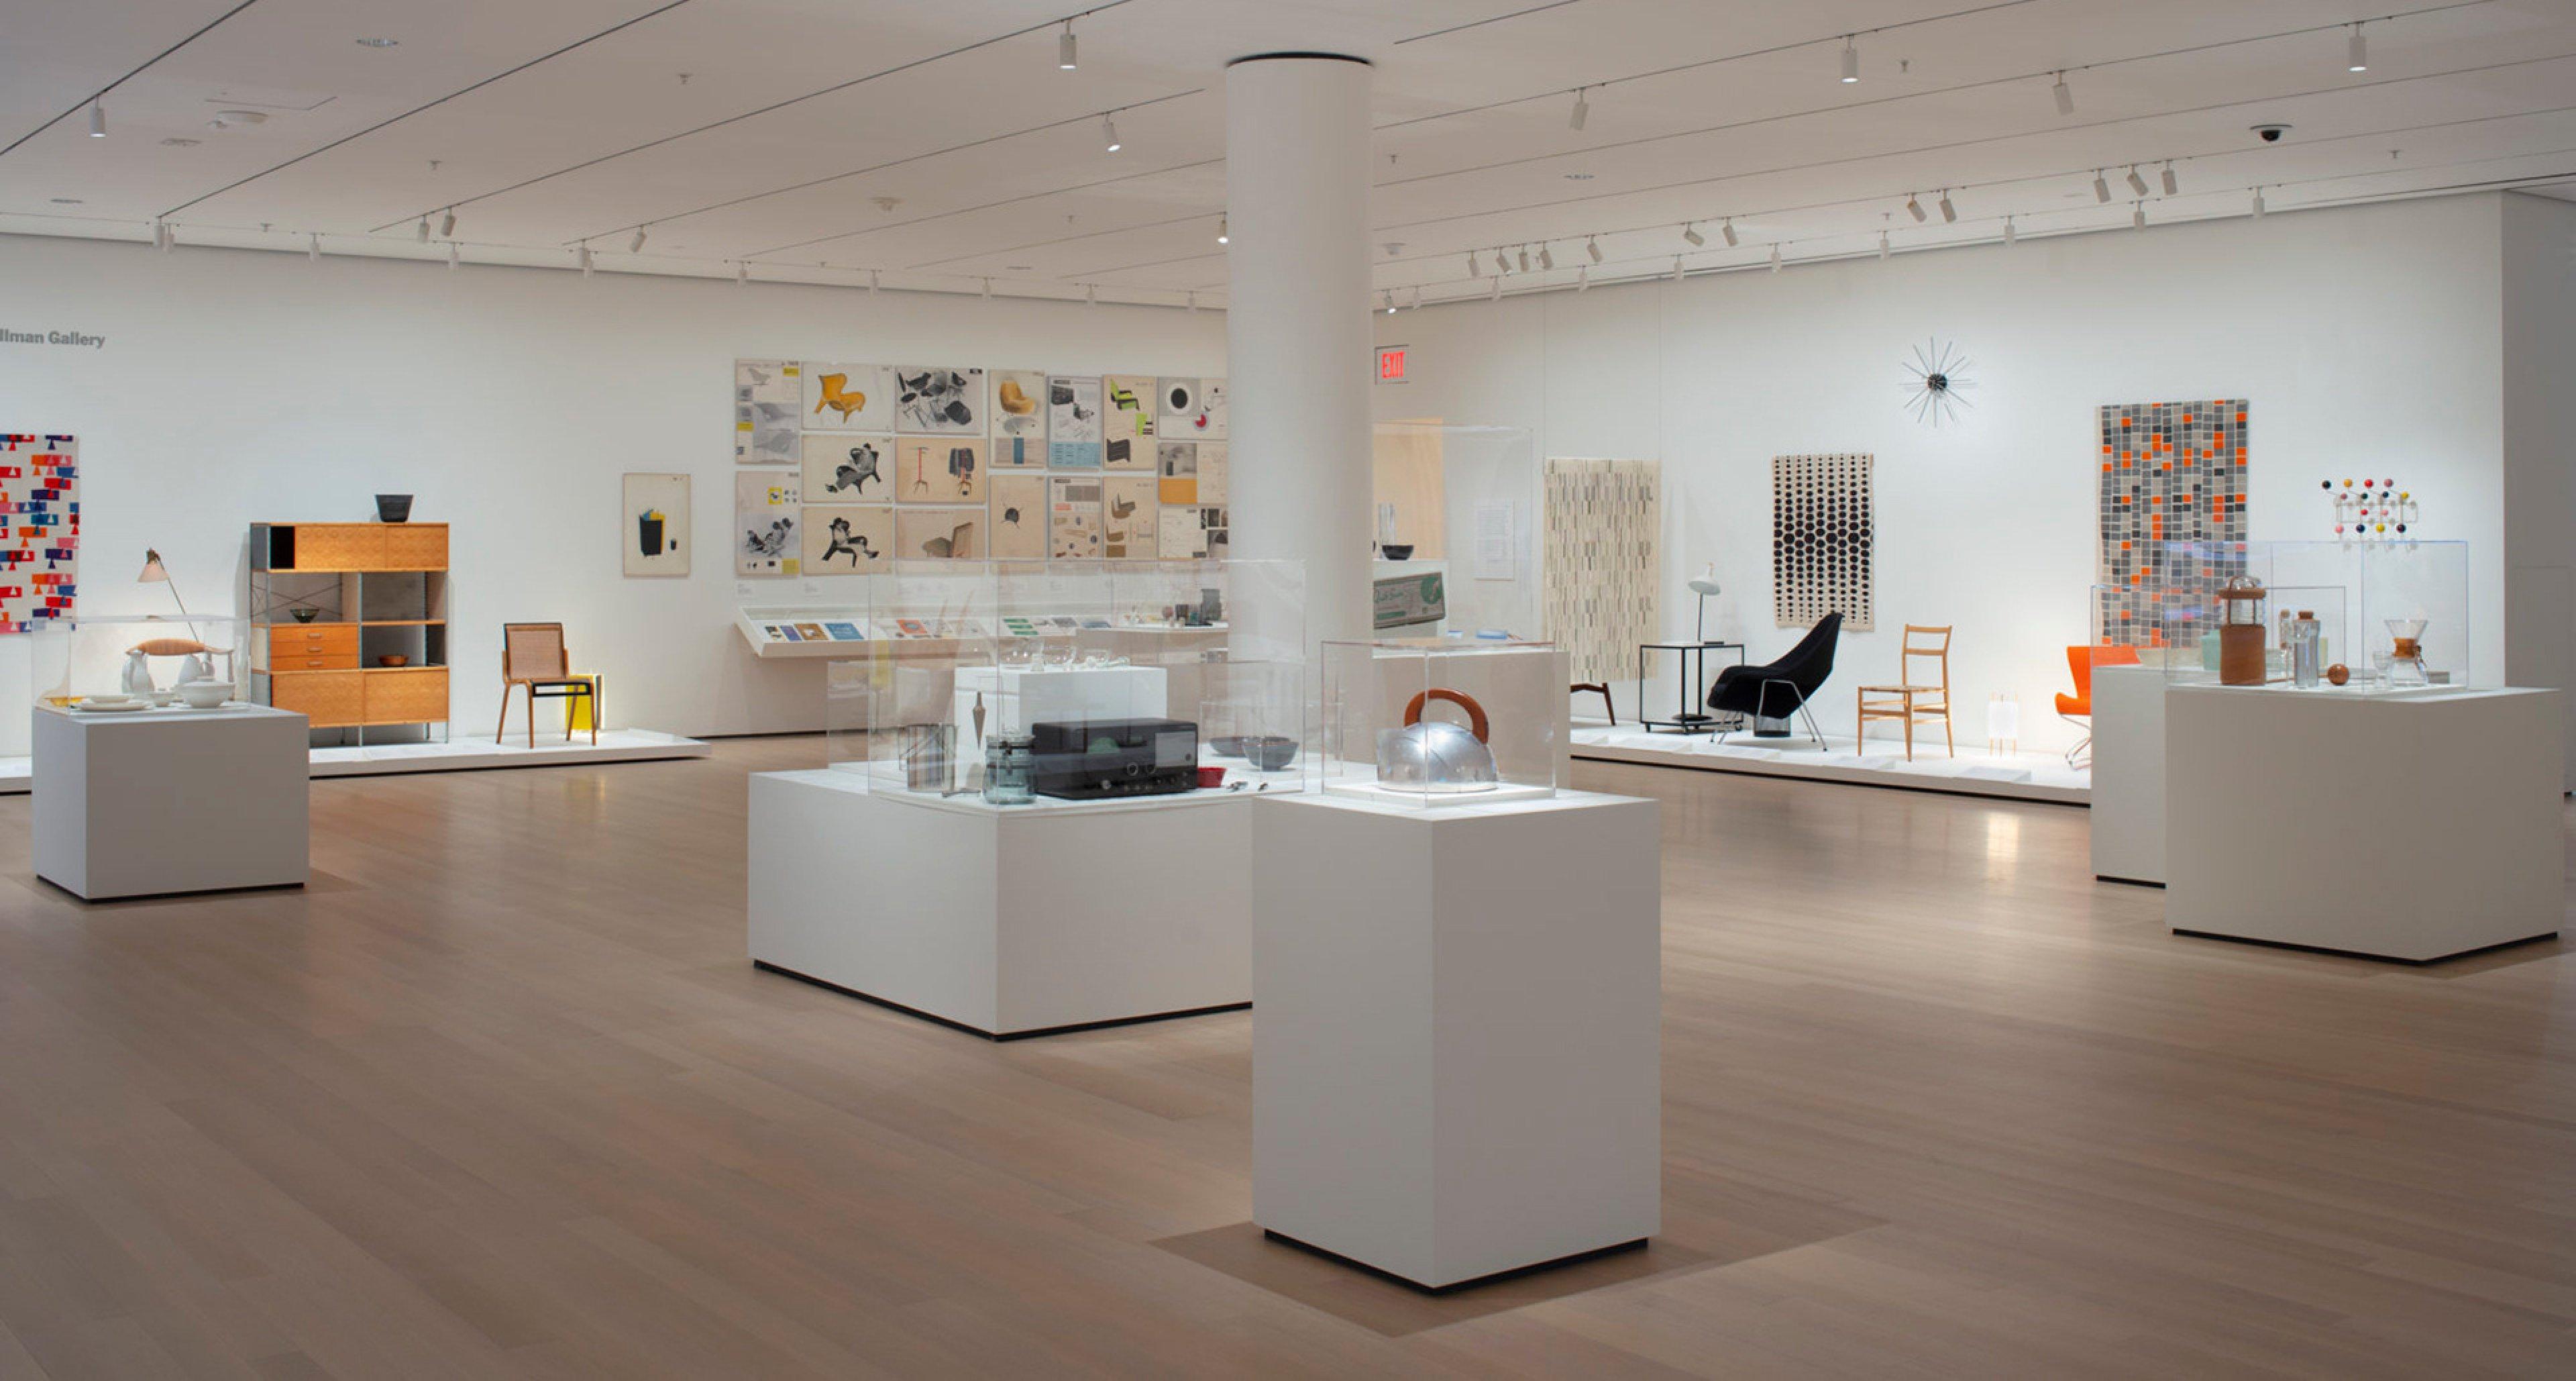 Installation view, The Value of Good Design at The Museum of Modern Art, New York (February 10–June 15, 2019). Digital image © 2019 The Museum of Modern Art, New York. Photo: John Wronn